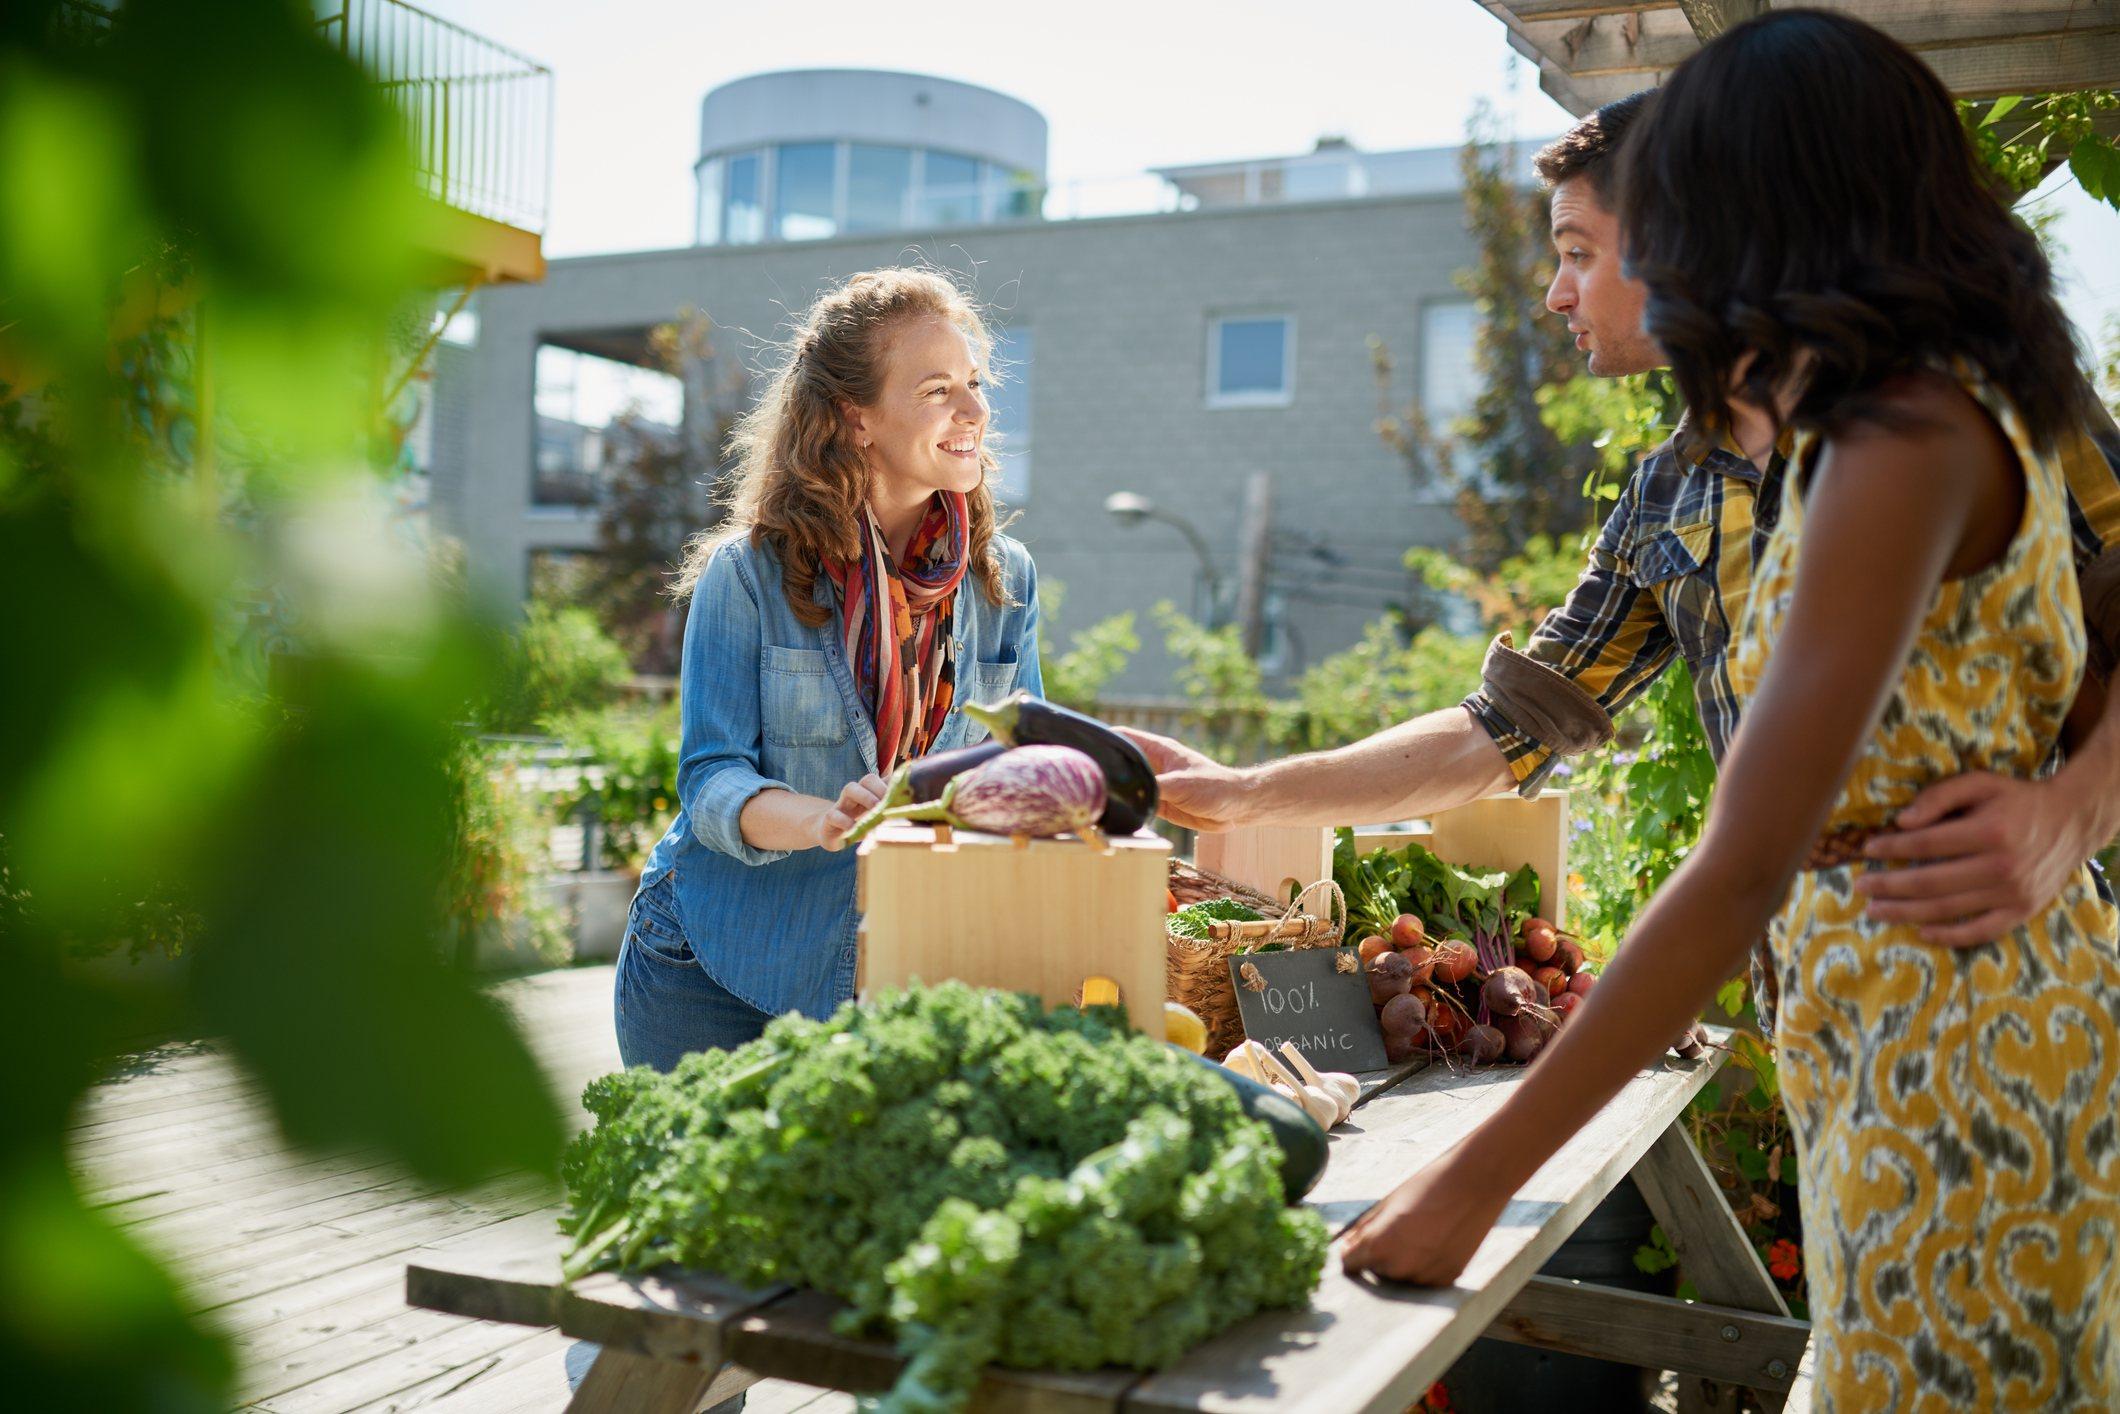 Friendly woman tending an organic vegetable stall at a farmer